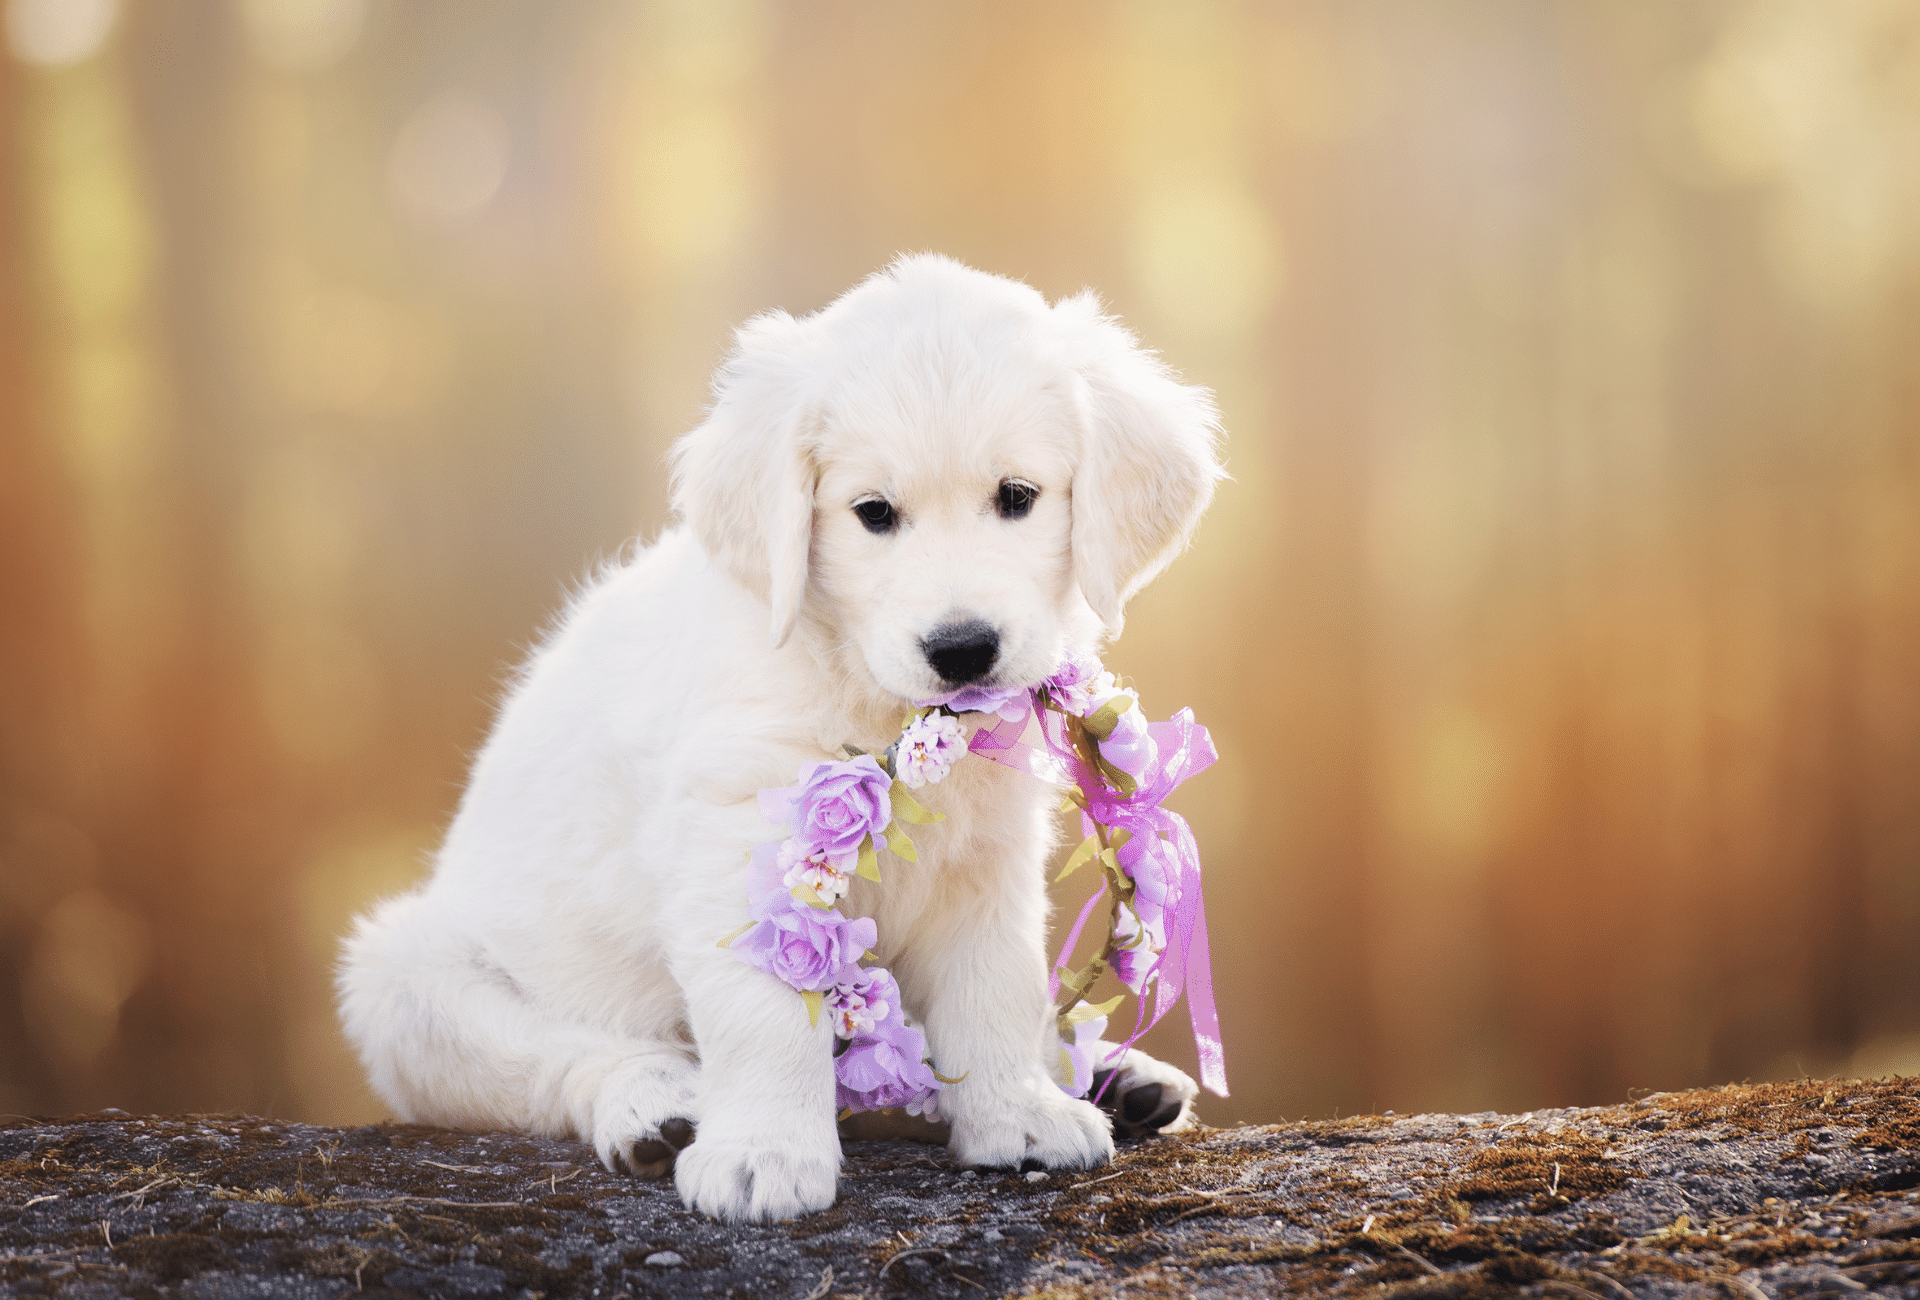 cute puppy holding flower crone